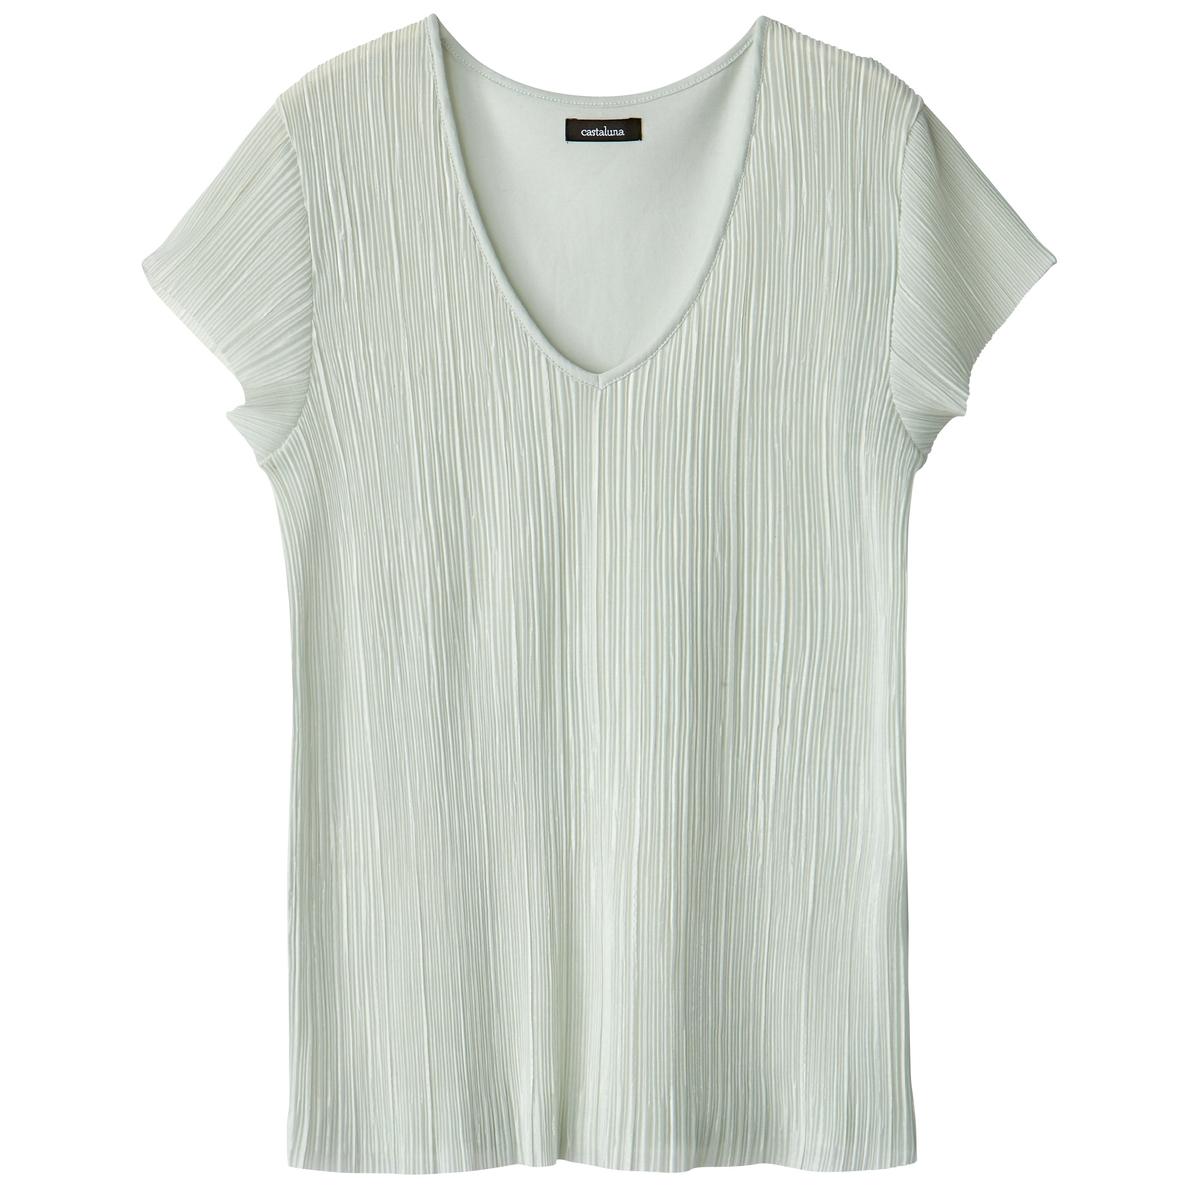 T-shirt plissada bimatéria, mangas curtas